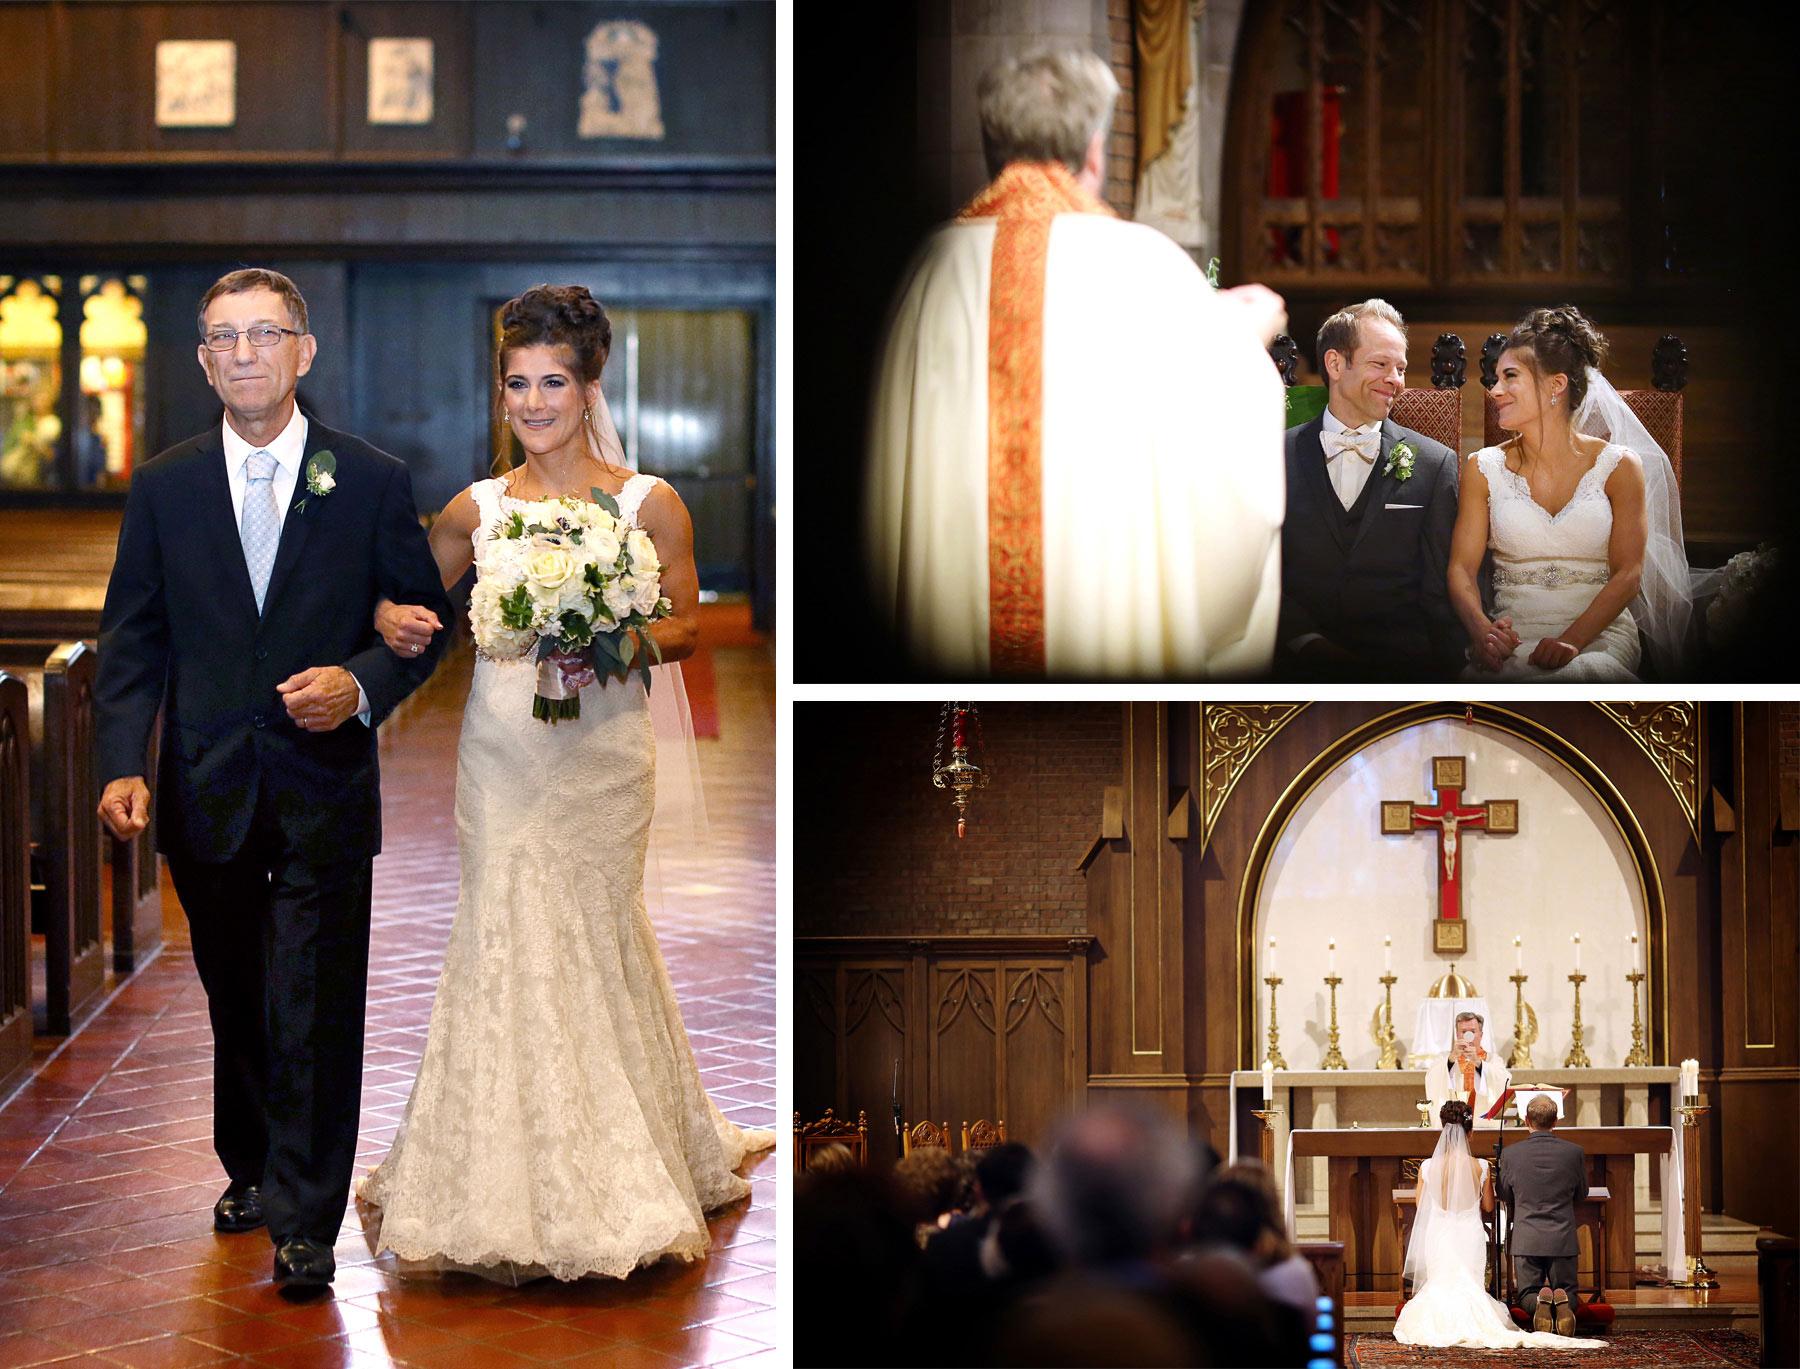 06-Saint-Louis-Park-Minnesota-Wedding-Photographer-by-Andrew-Vick-Photography-Fall-Autumn-Holy-Family-Catholic-Church-Ceremony-Bride-Groom-Father-Parents-Processional-Vows-Prayer-Paula-and-Jason.jpg